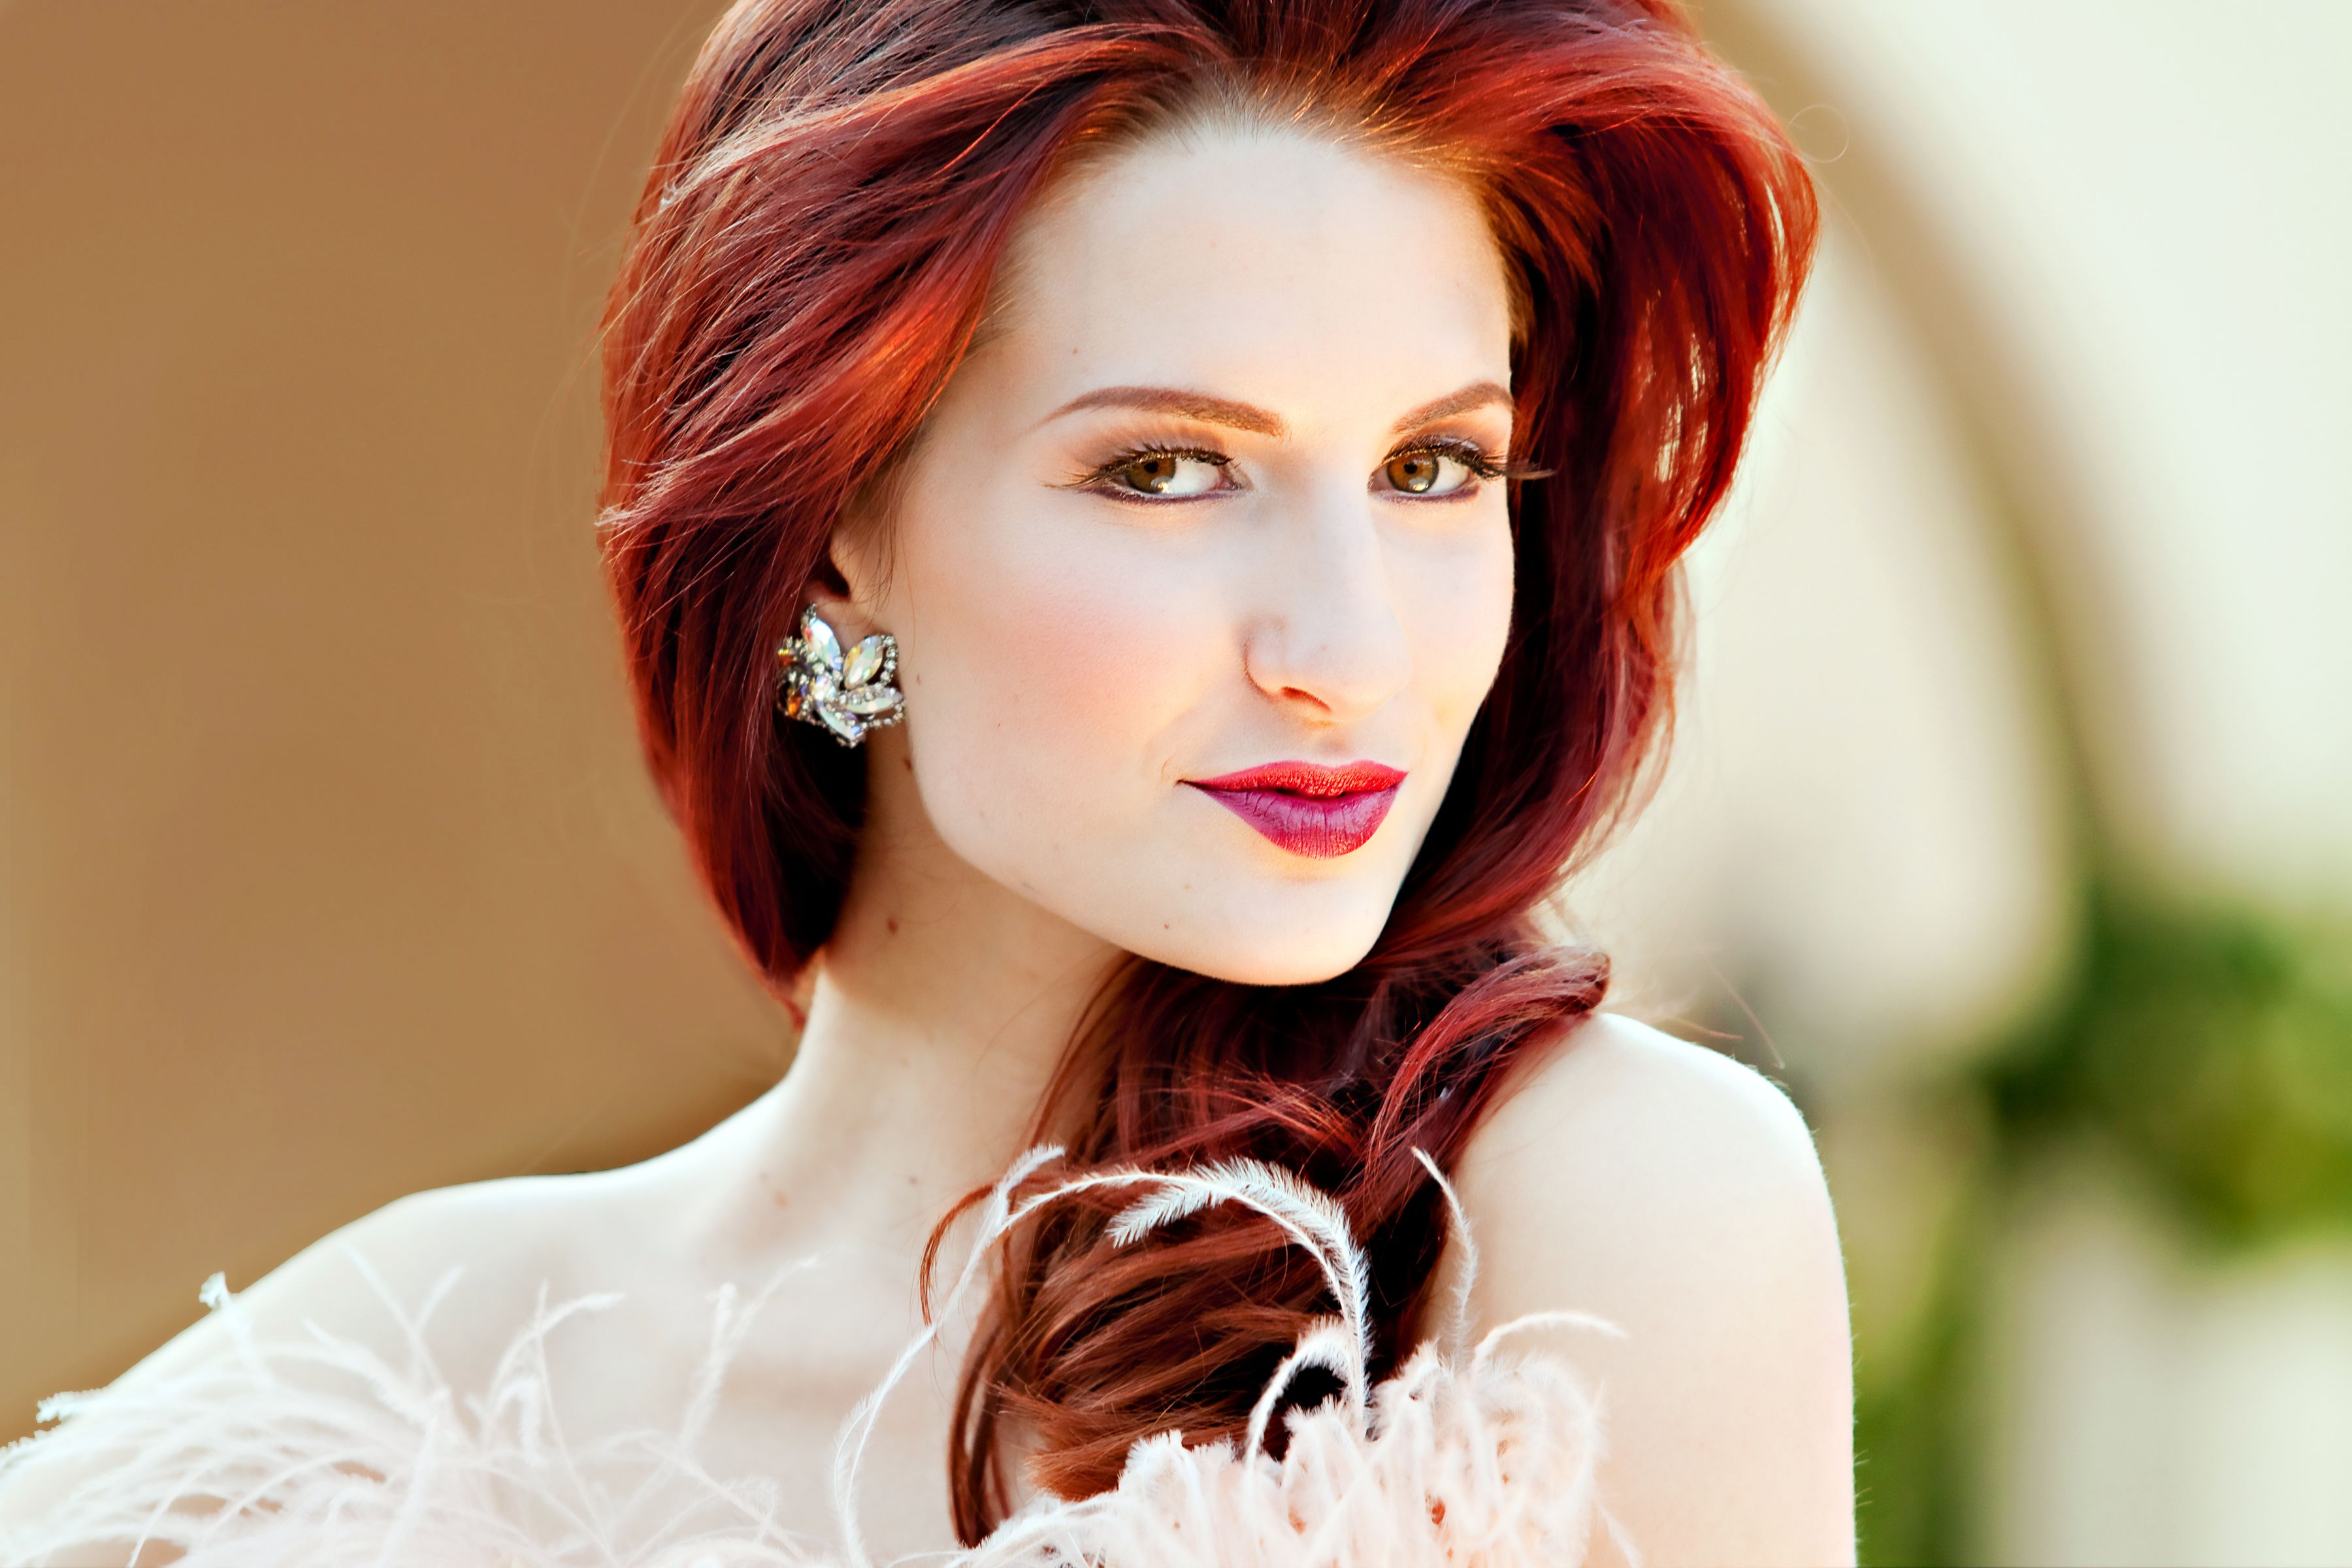 Hair/Makeup Photo www.kathleenharrison